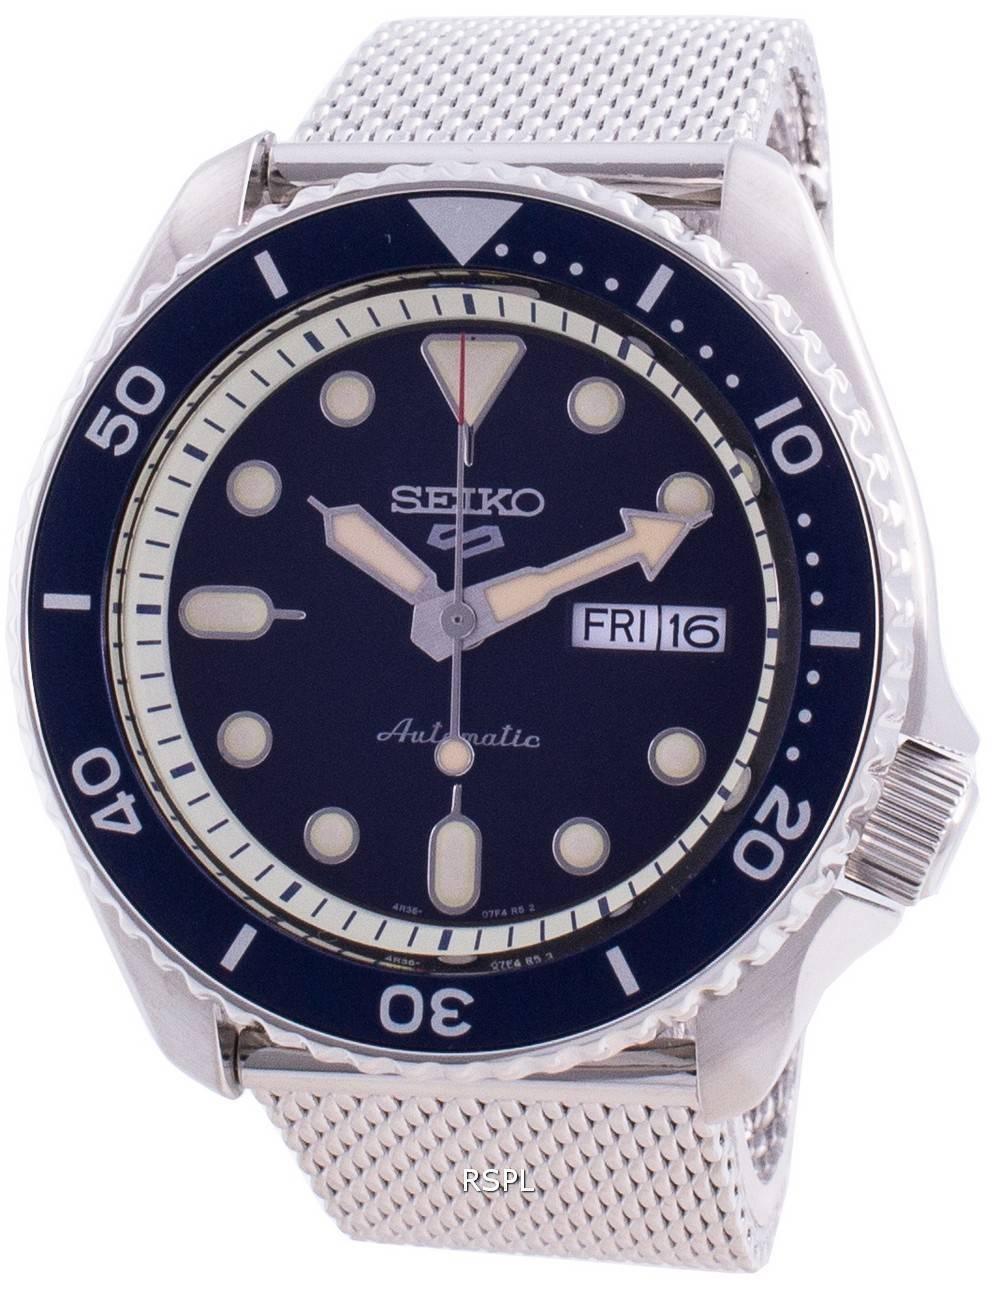 Seiko 5 Sports Suits Style Automatic SRPD71 SRPD71K1 SRPD71K 100M Men's Watch